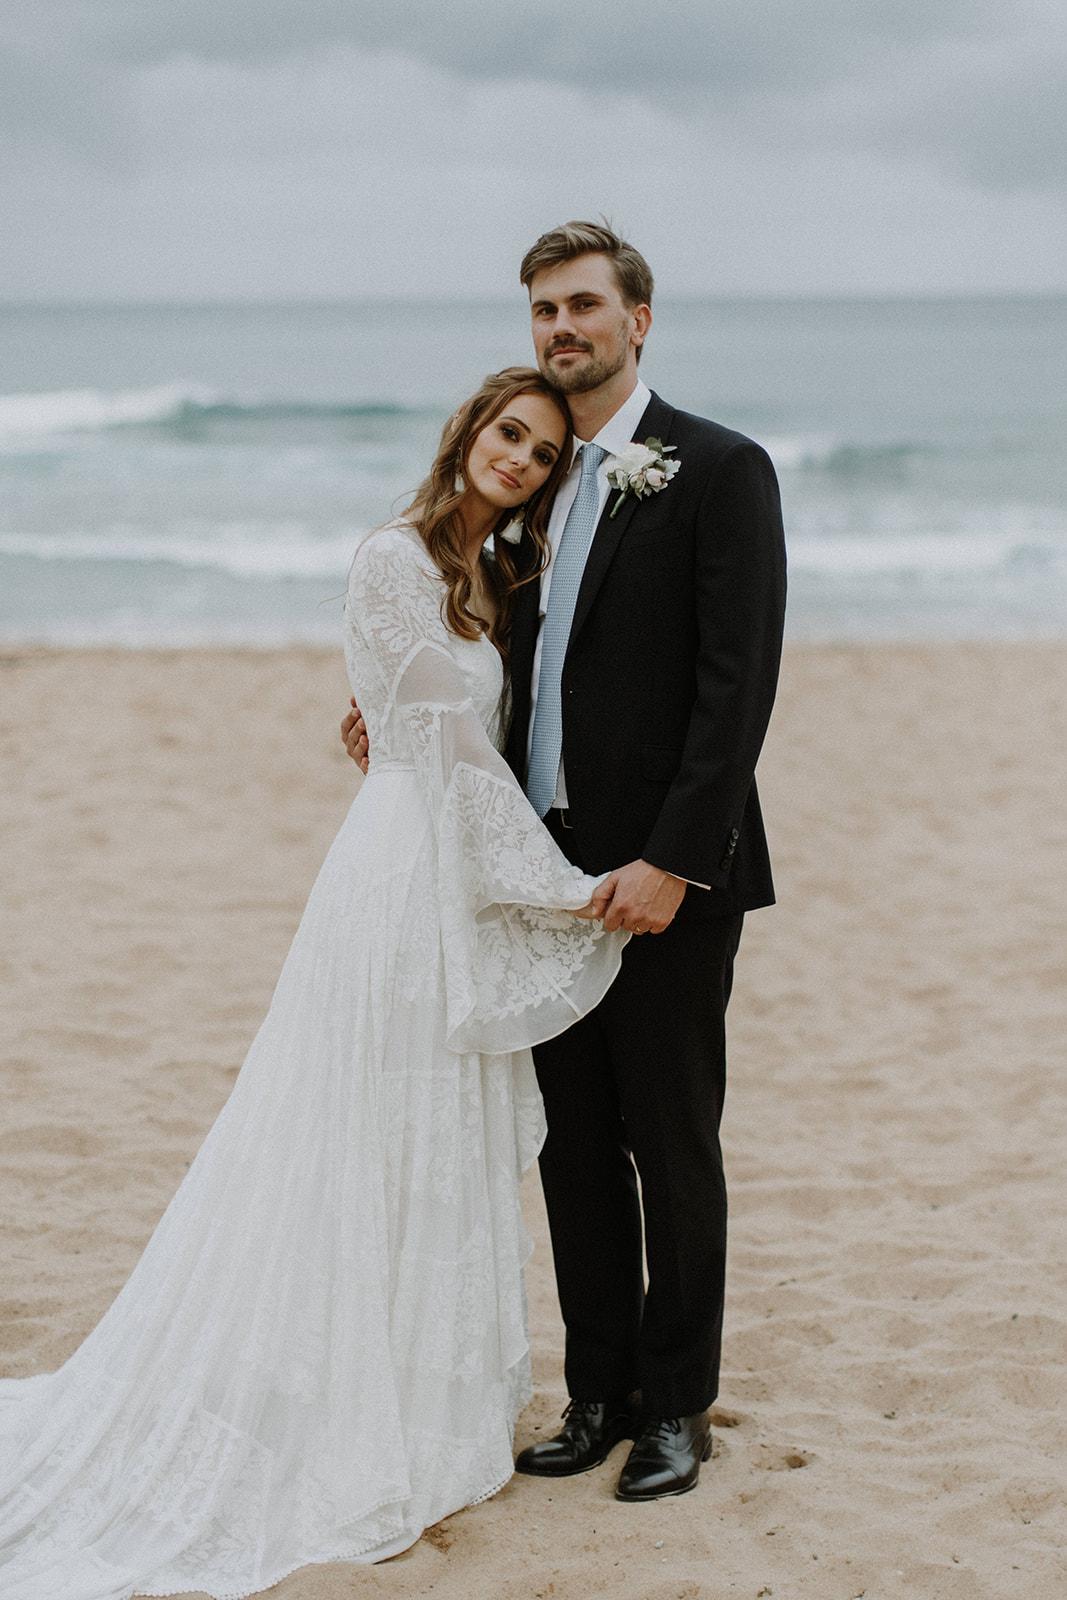 CAMILLA & JAMES' PALM BEACH WEDDING – Hello May